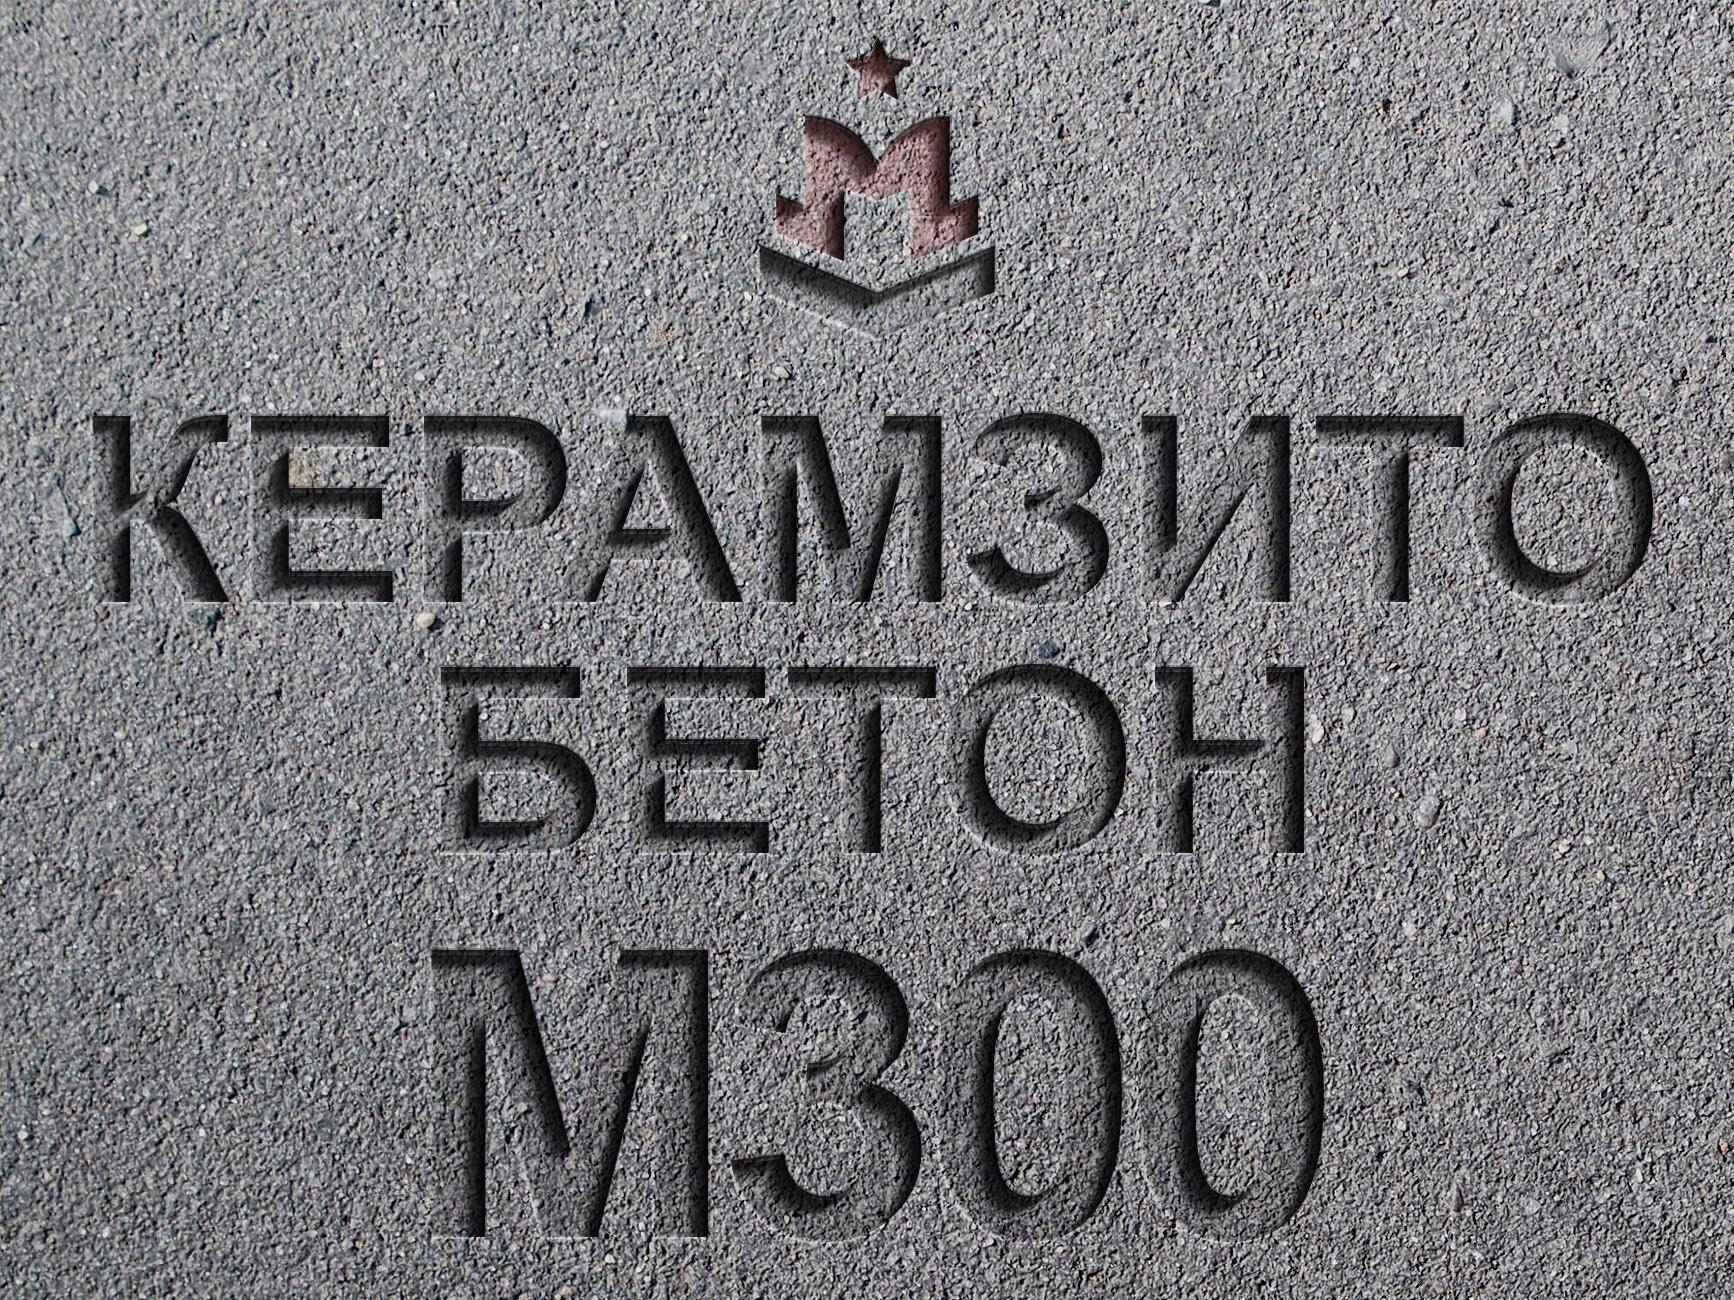 Керамзитобетон м300 поверхностная гидроизоляция бетона